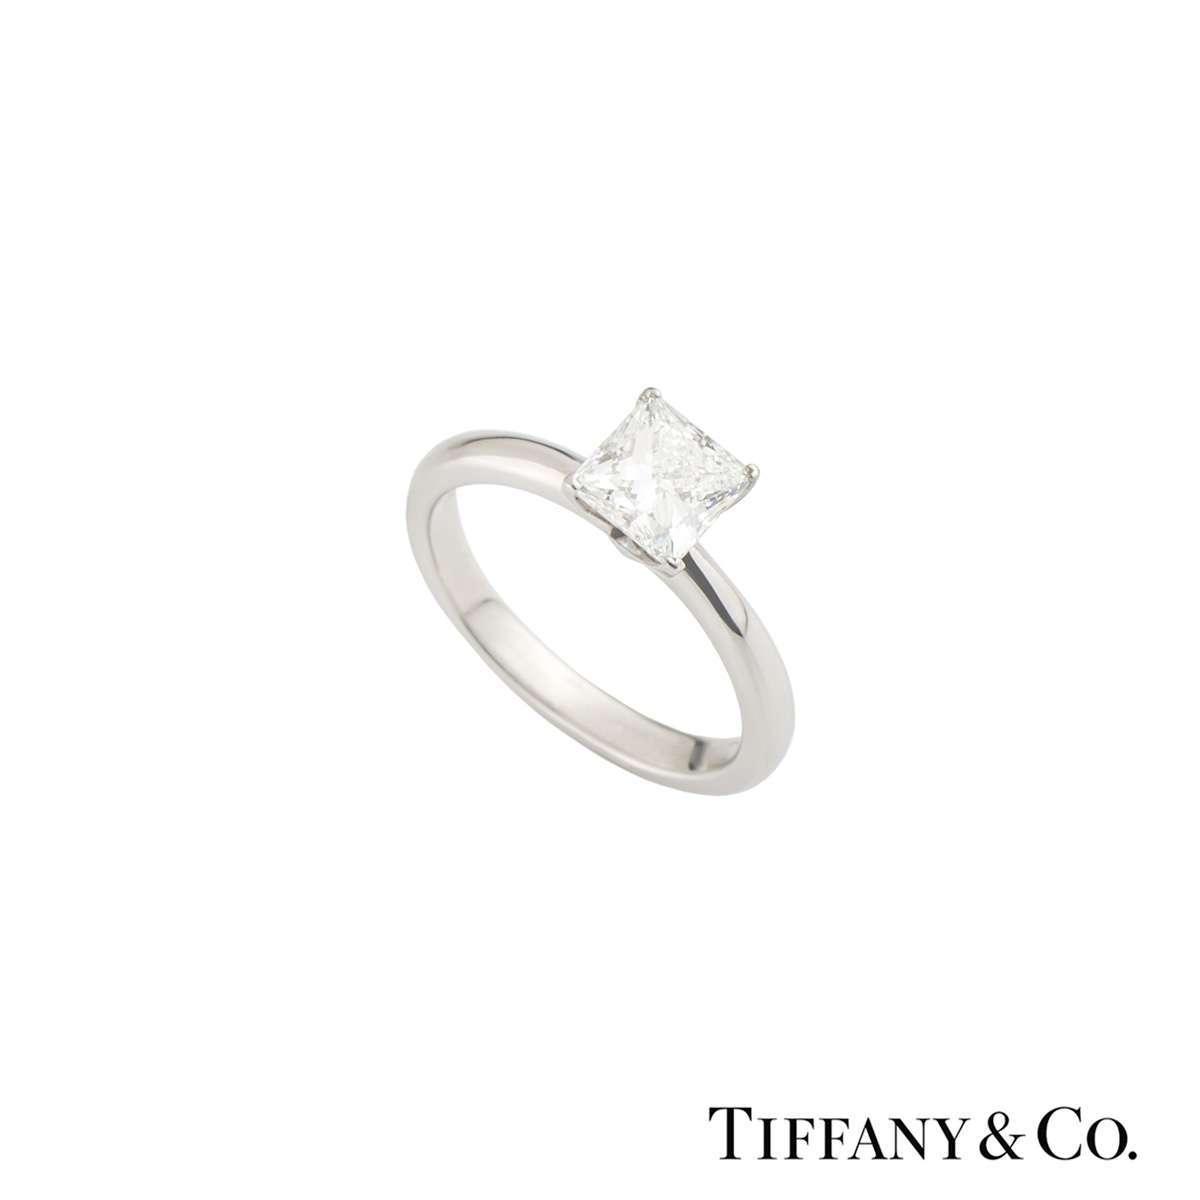 Tiffany & Co. Platinum Princess Cut Diamond Ring 1.55ct F/VS2